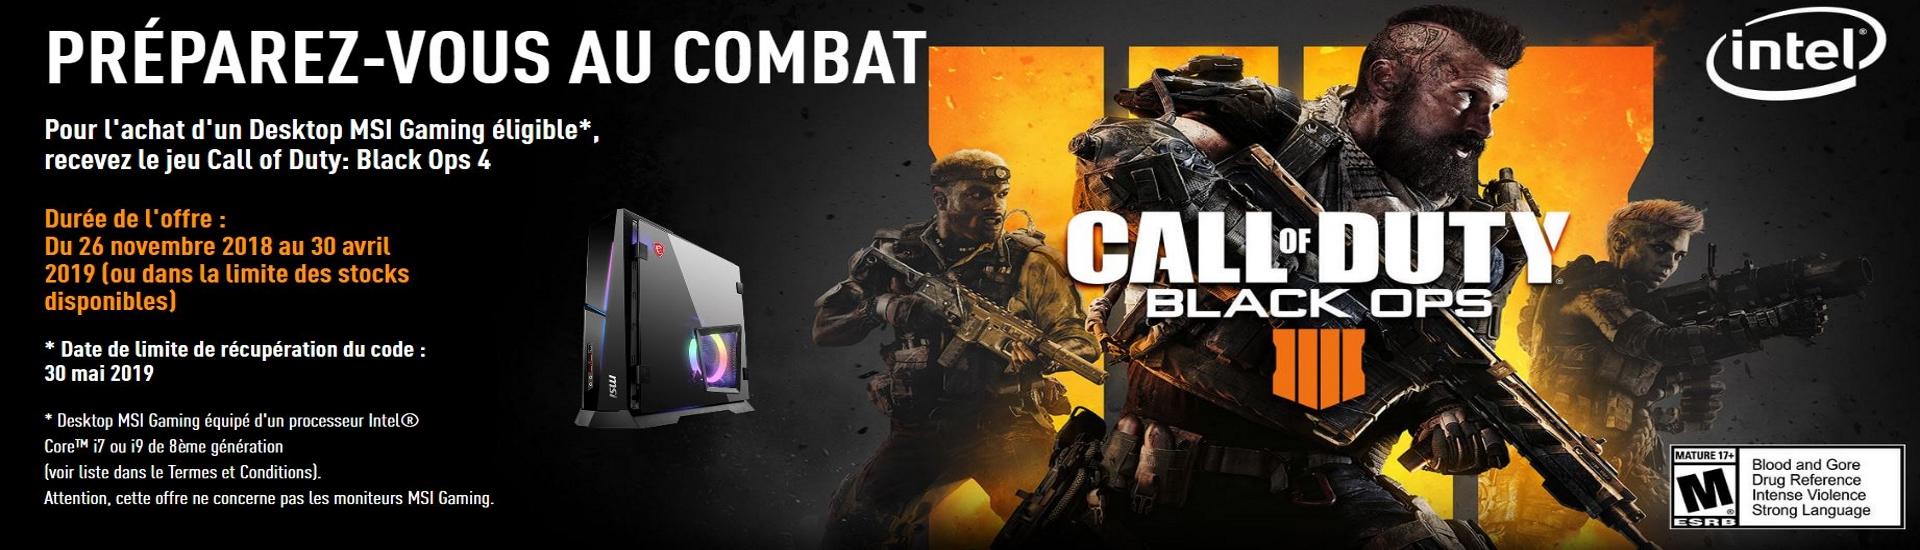 Intel Call of Duty